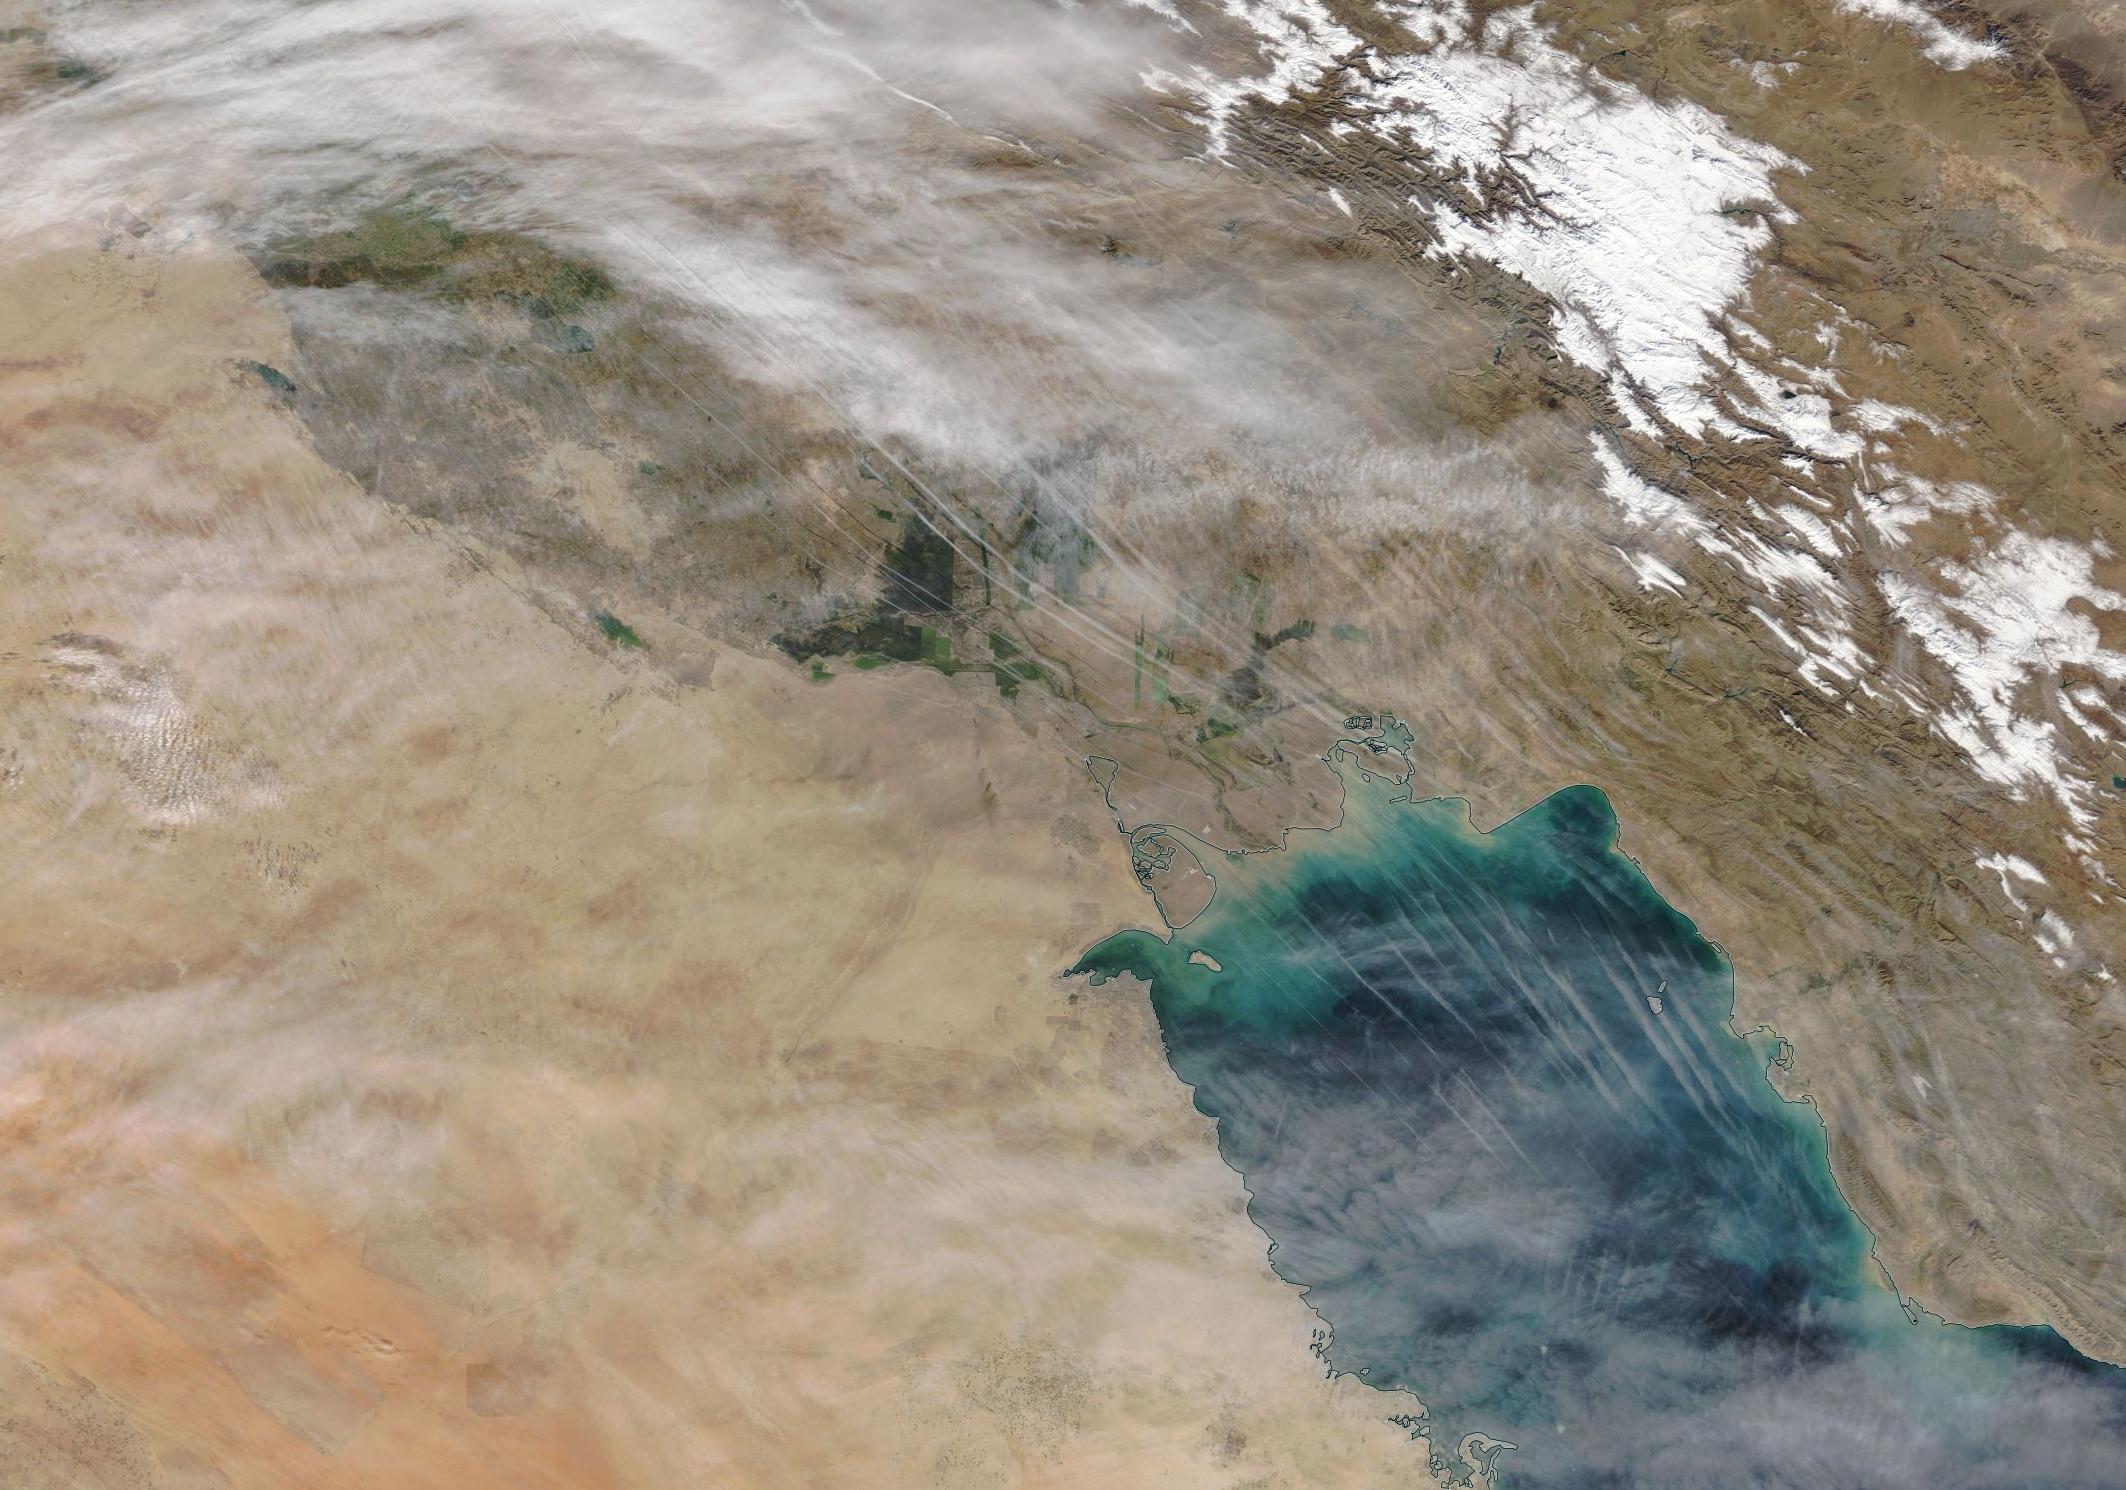 Baghdad, Basra, Kuwait chemtrail geoengineering. Thursday 12th Dec 2019. https://go.nasa.gov/2LTBaR9